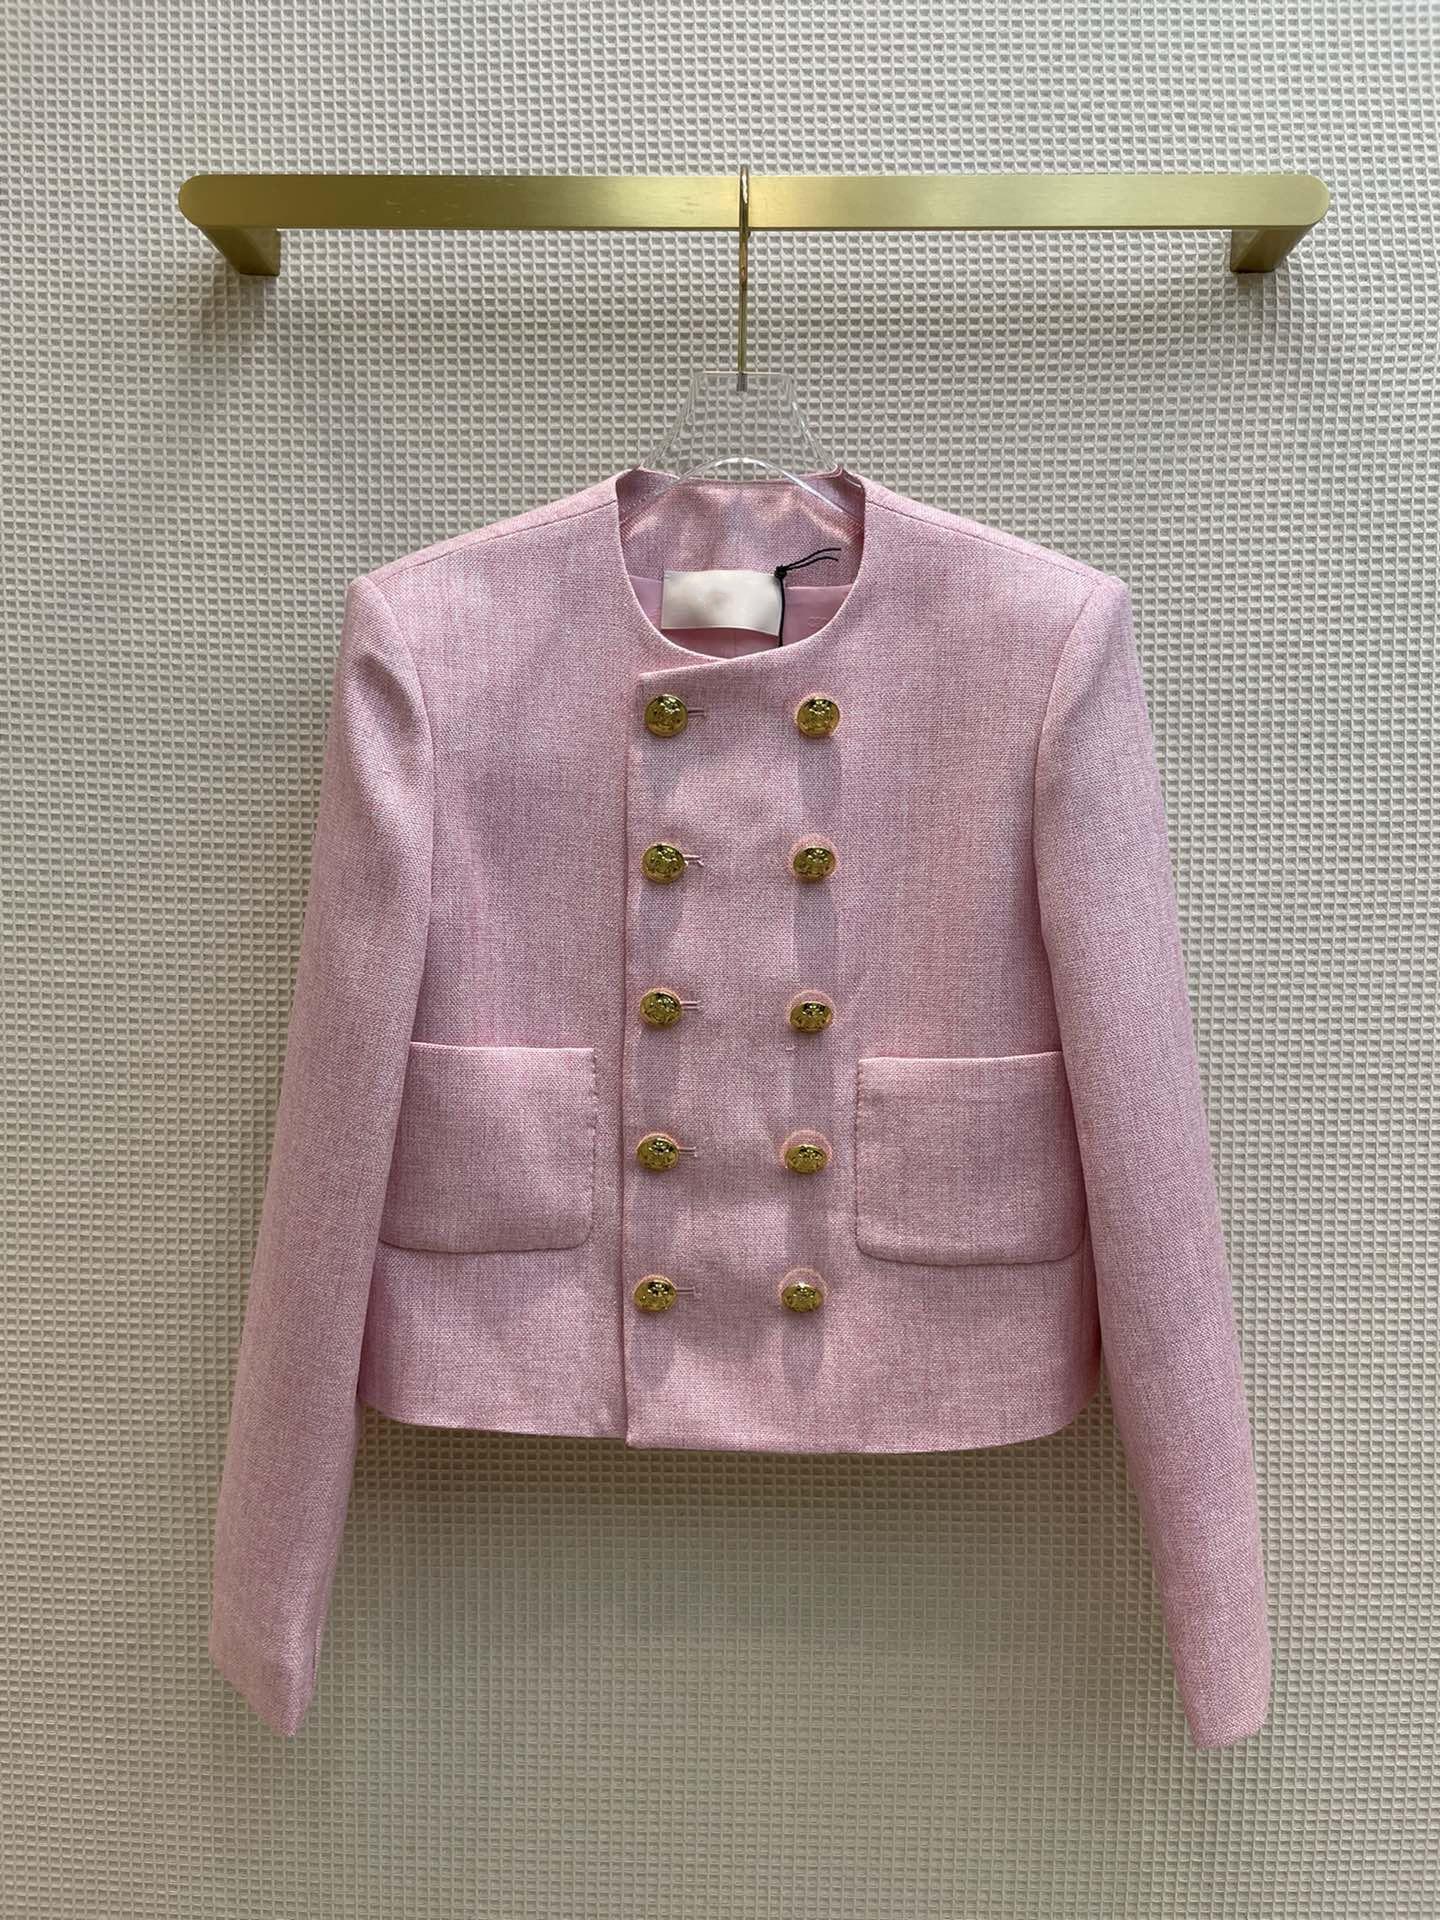 Milan Runway Coats 2021 Long Sleeve Print Women's Coats Designer Coats Brand Same Style Jackets 0509-6